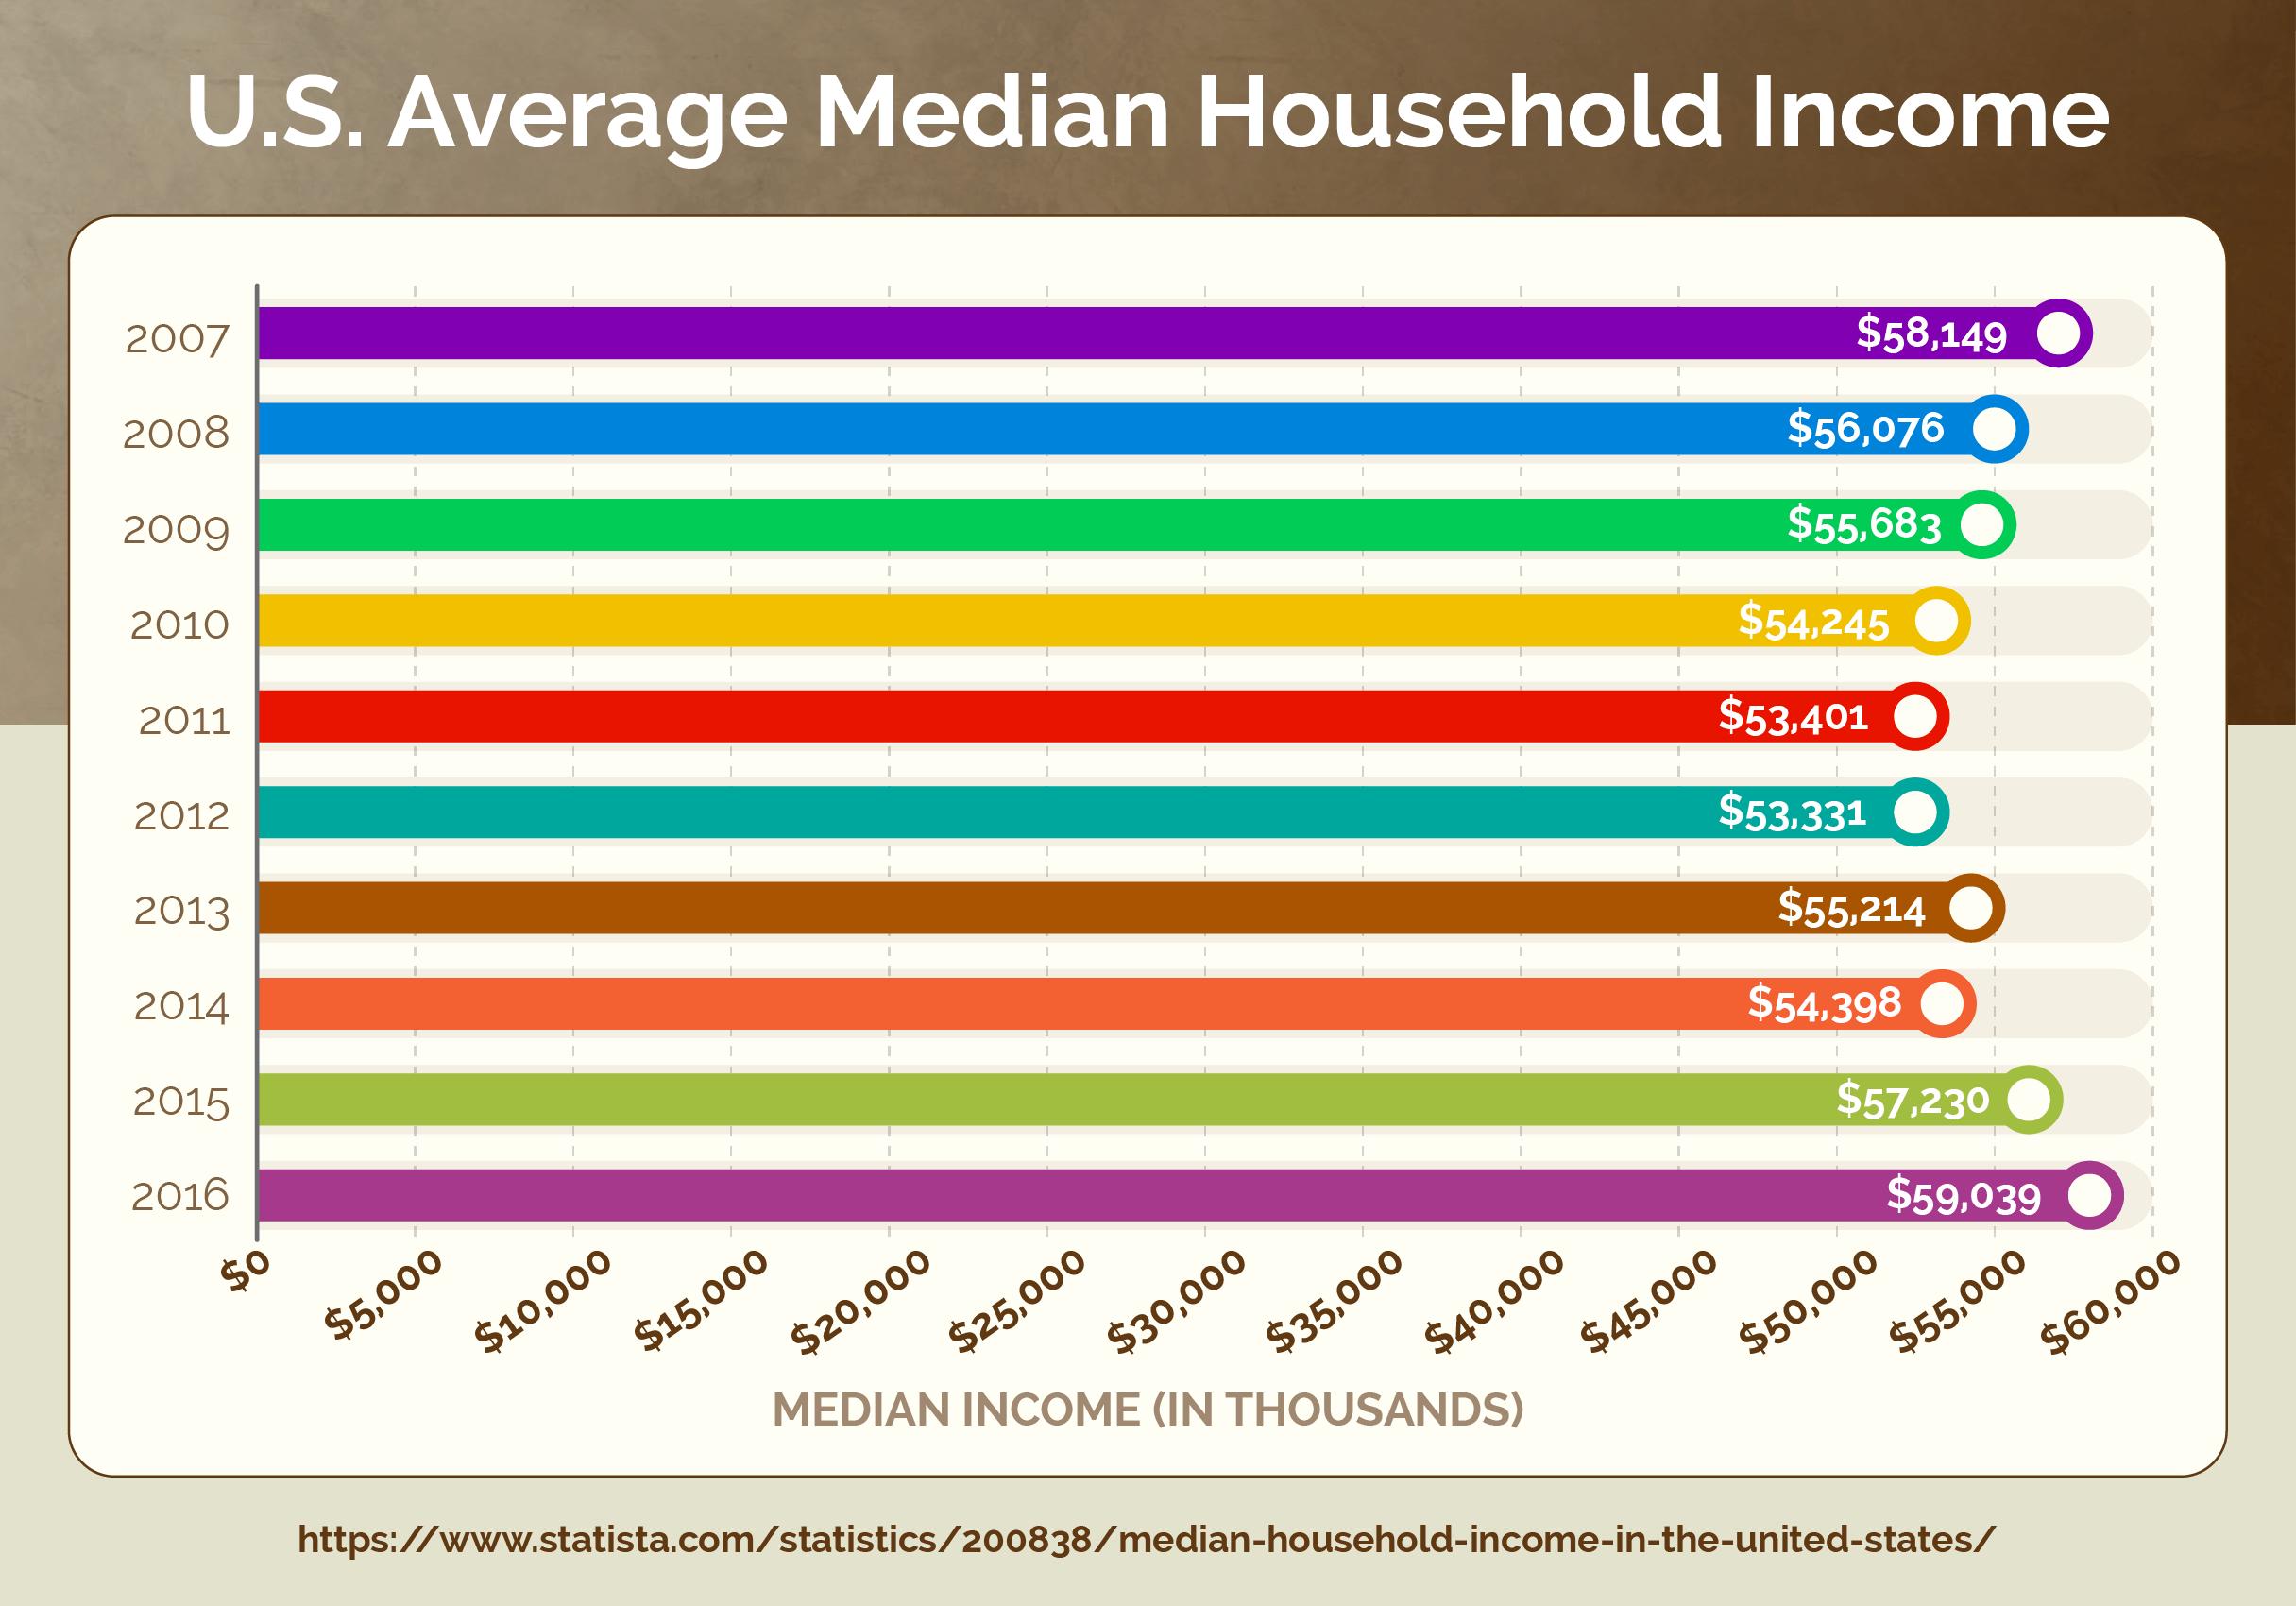 U.S. Average Median Household Income